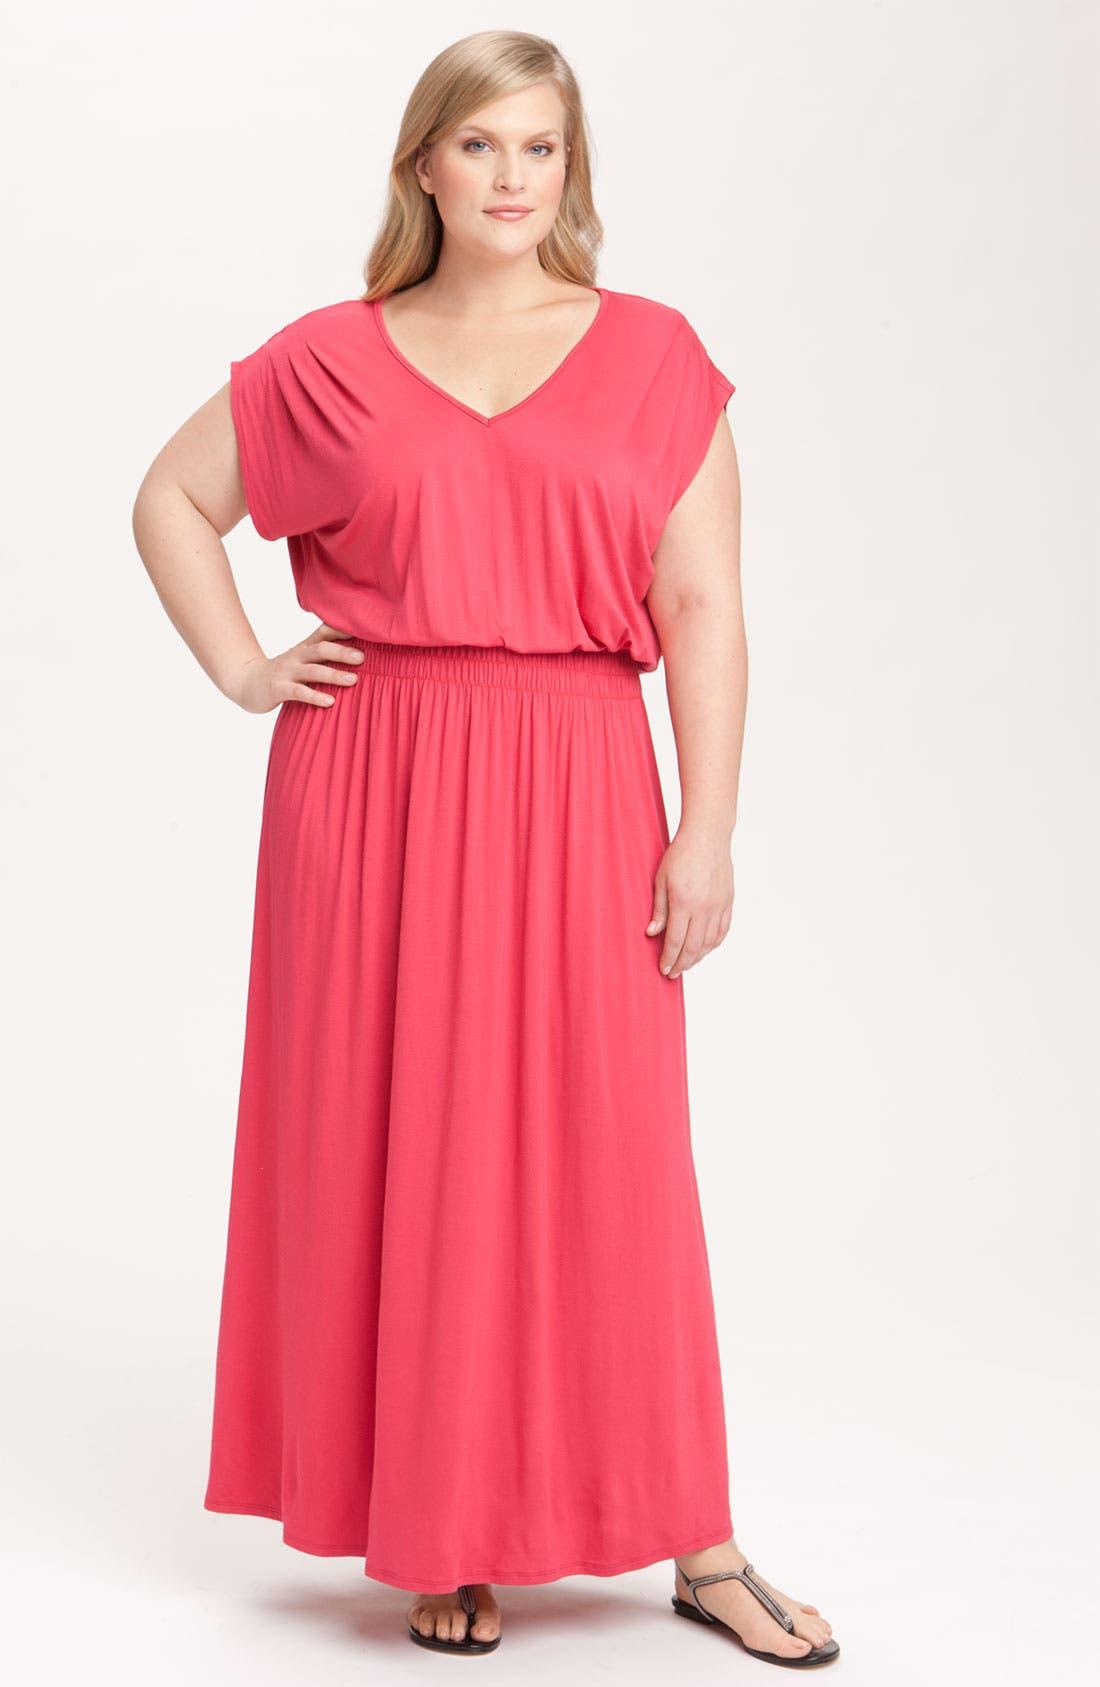 Alternate Image 1 Selected - Olivia Moon V-Neck Knit Maxi Dress (Plus)